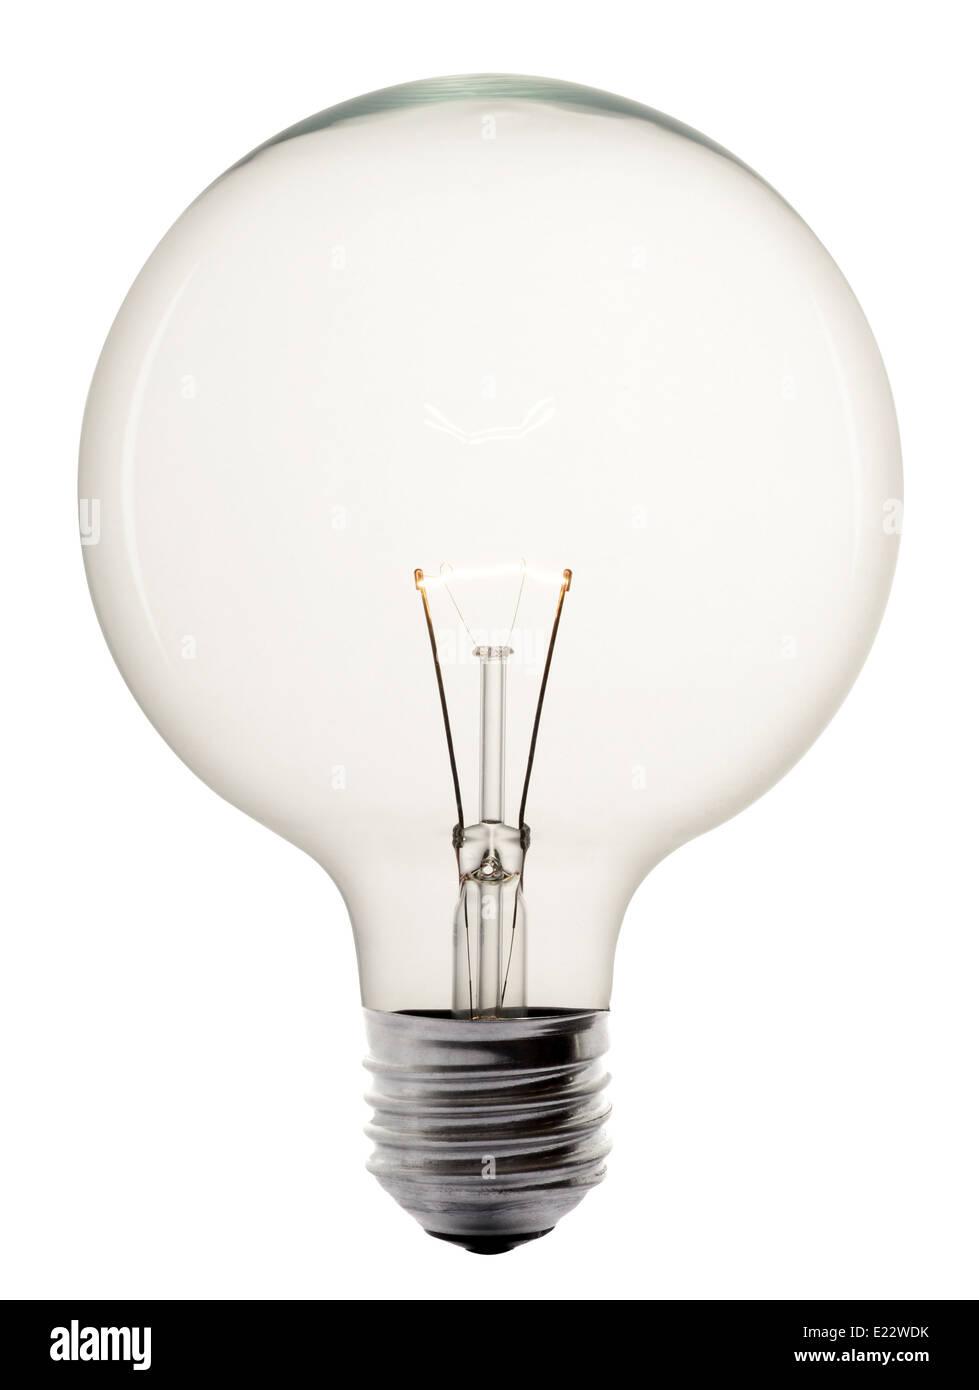 Single glowing glass light bulb - Stock Image